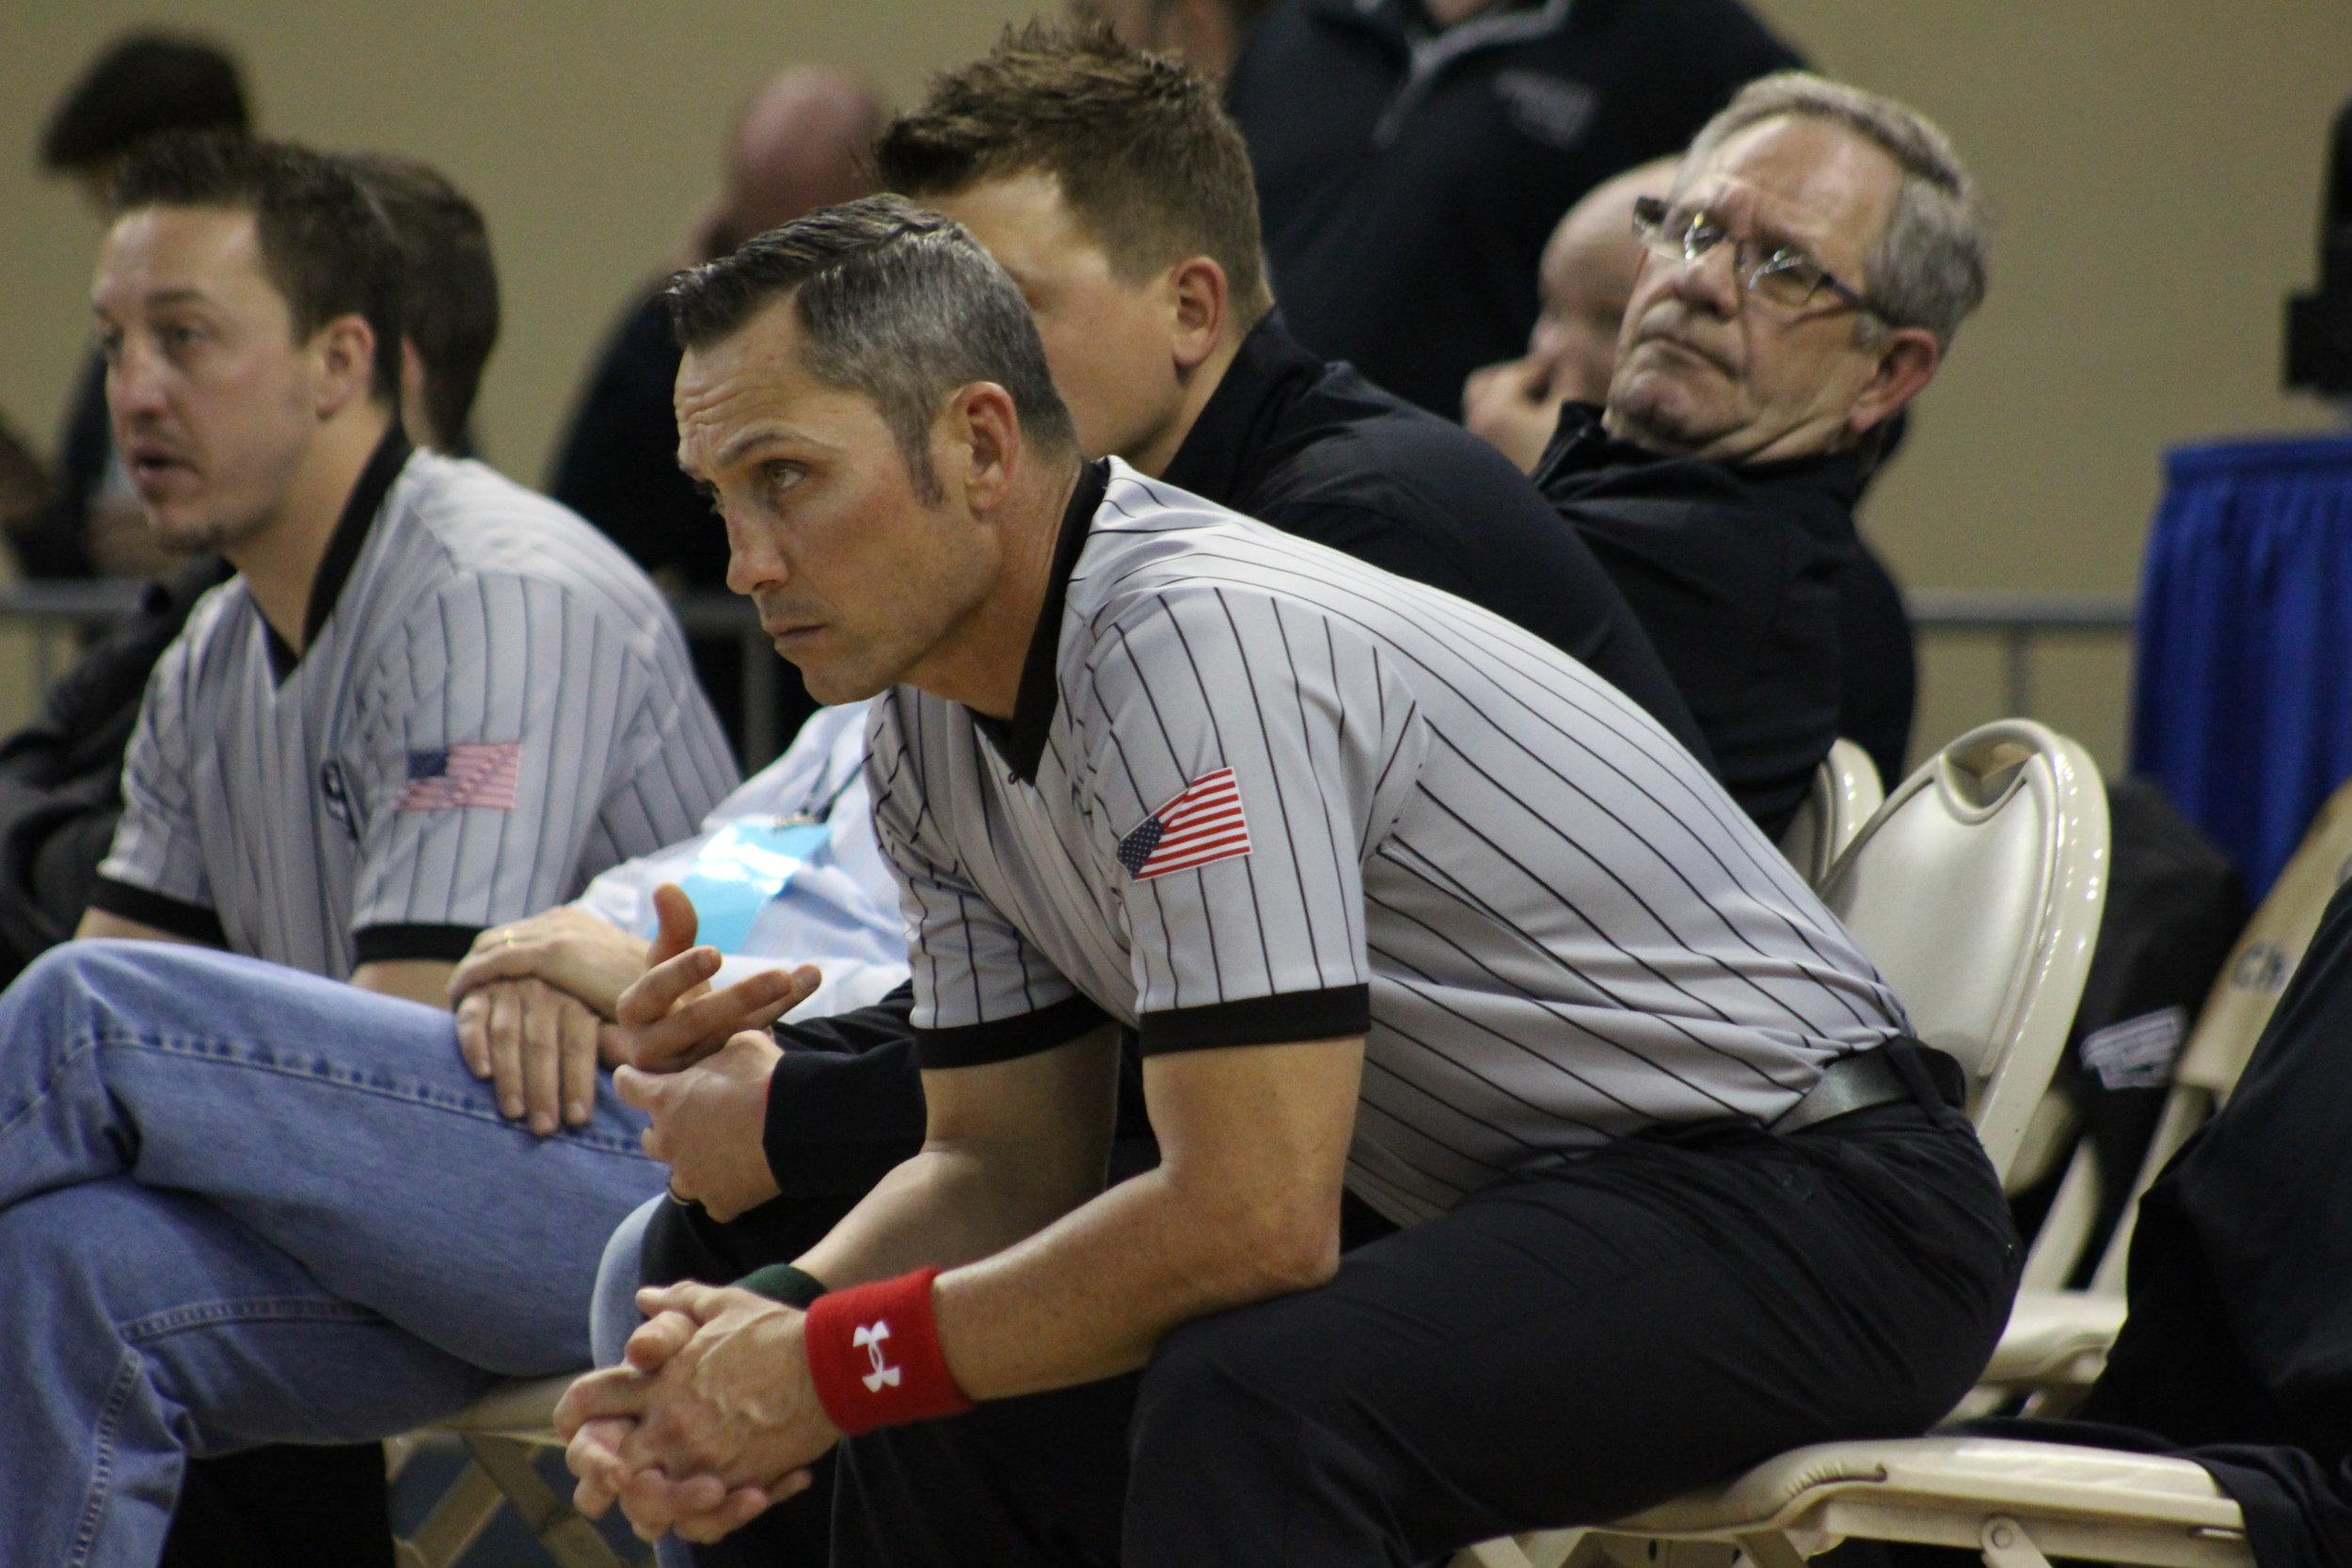 Sand Springs alumnus and referee Josh Briscoe eagerly watches Payton Scott's finals match.